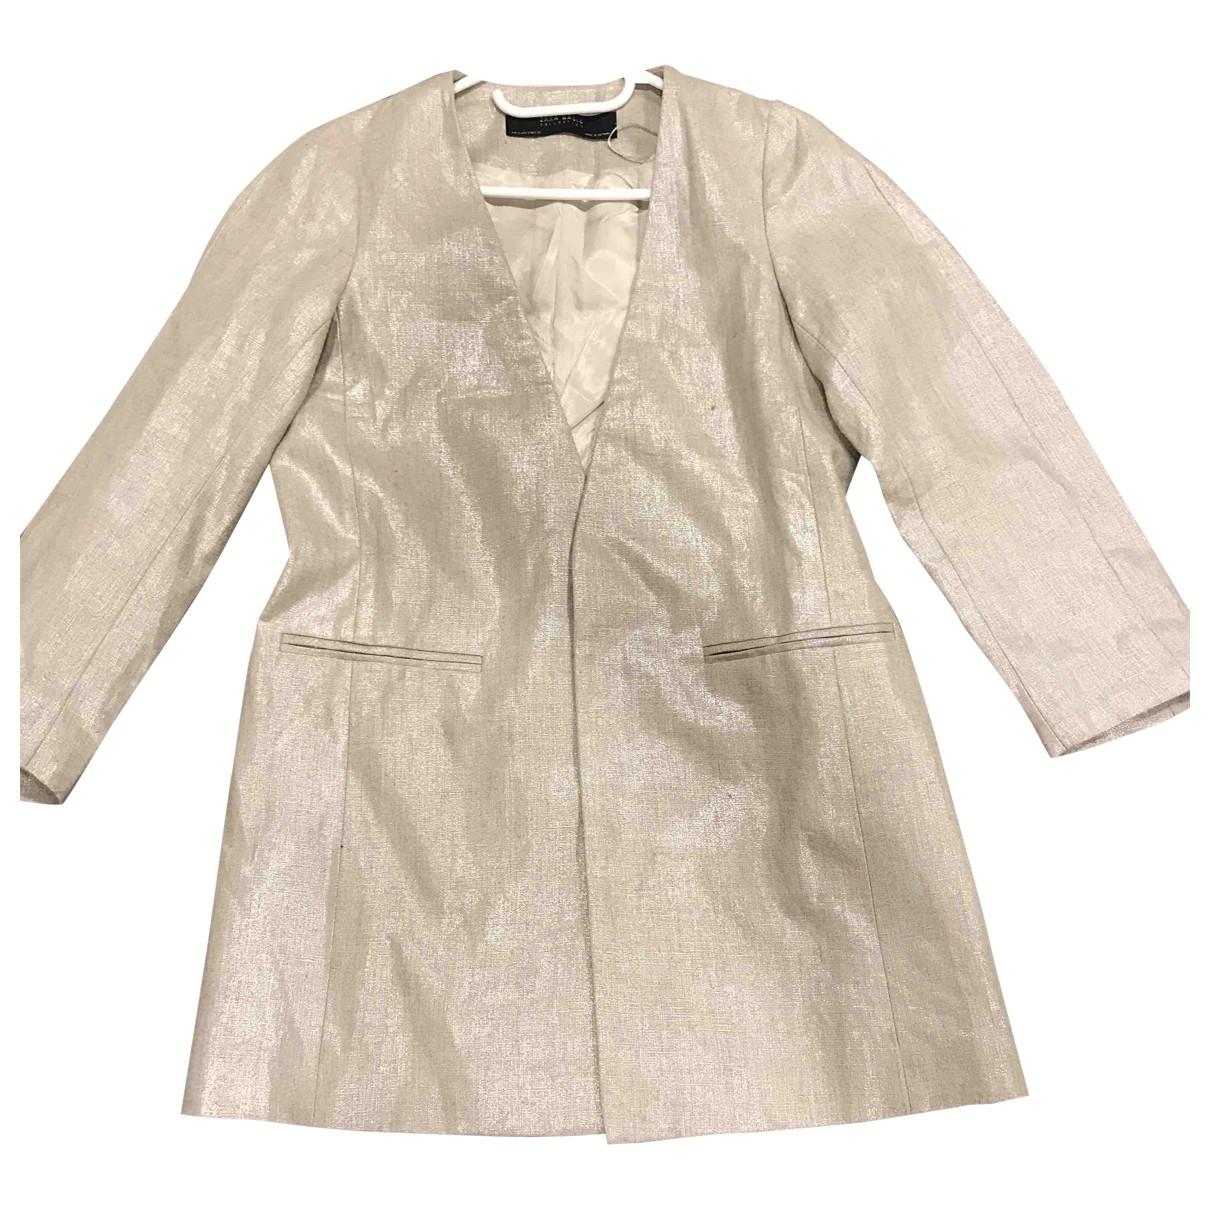 Zara - Veste   pour femme en lin - argente